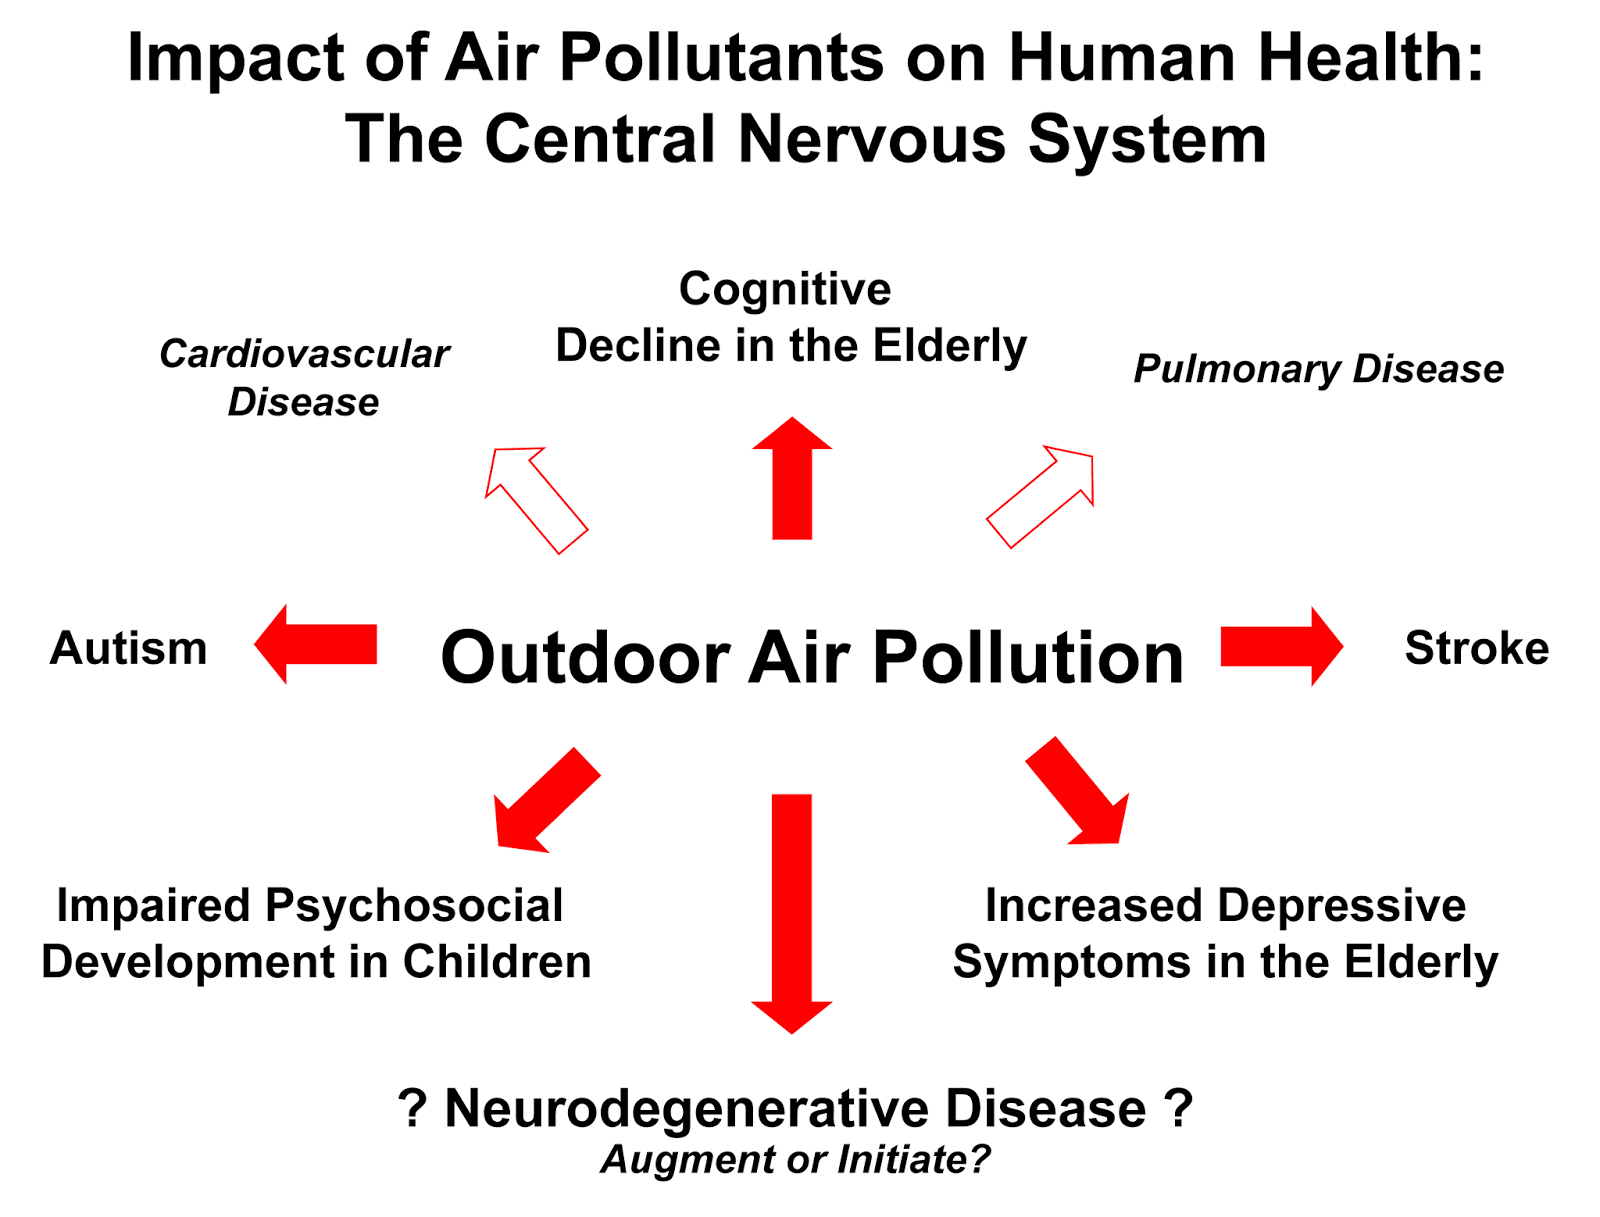 Smog pollution as a consequence of human behavior